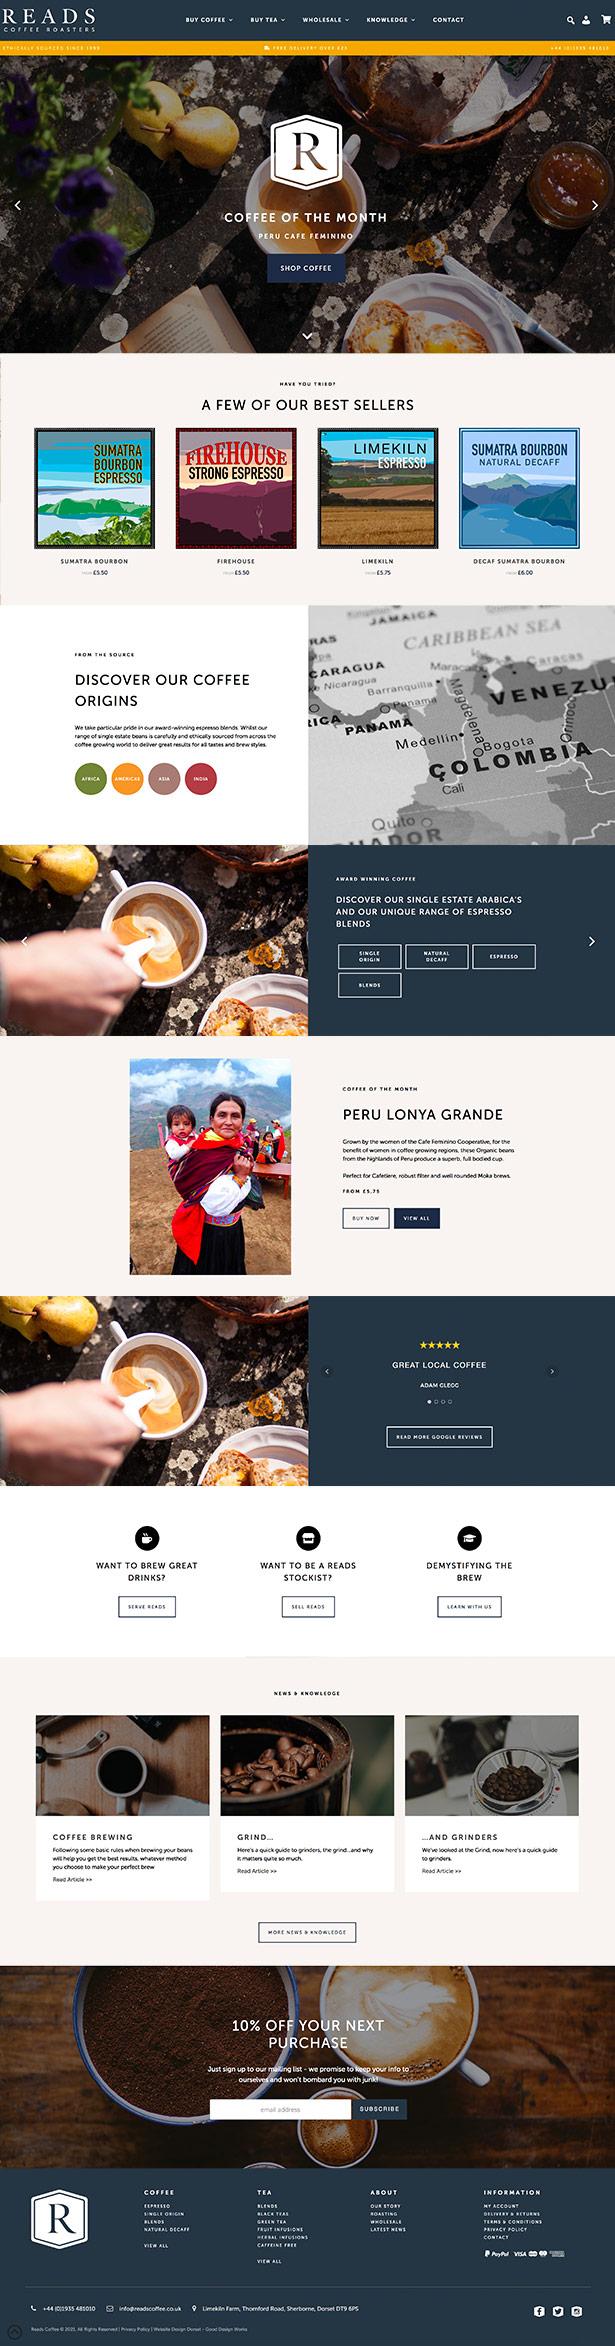 Reads Coffee Website Design